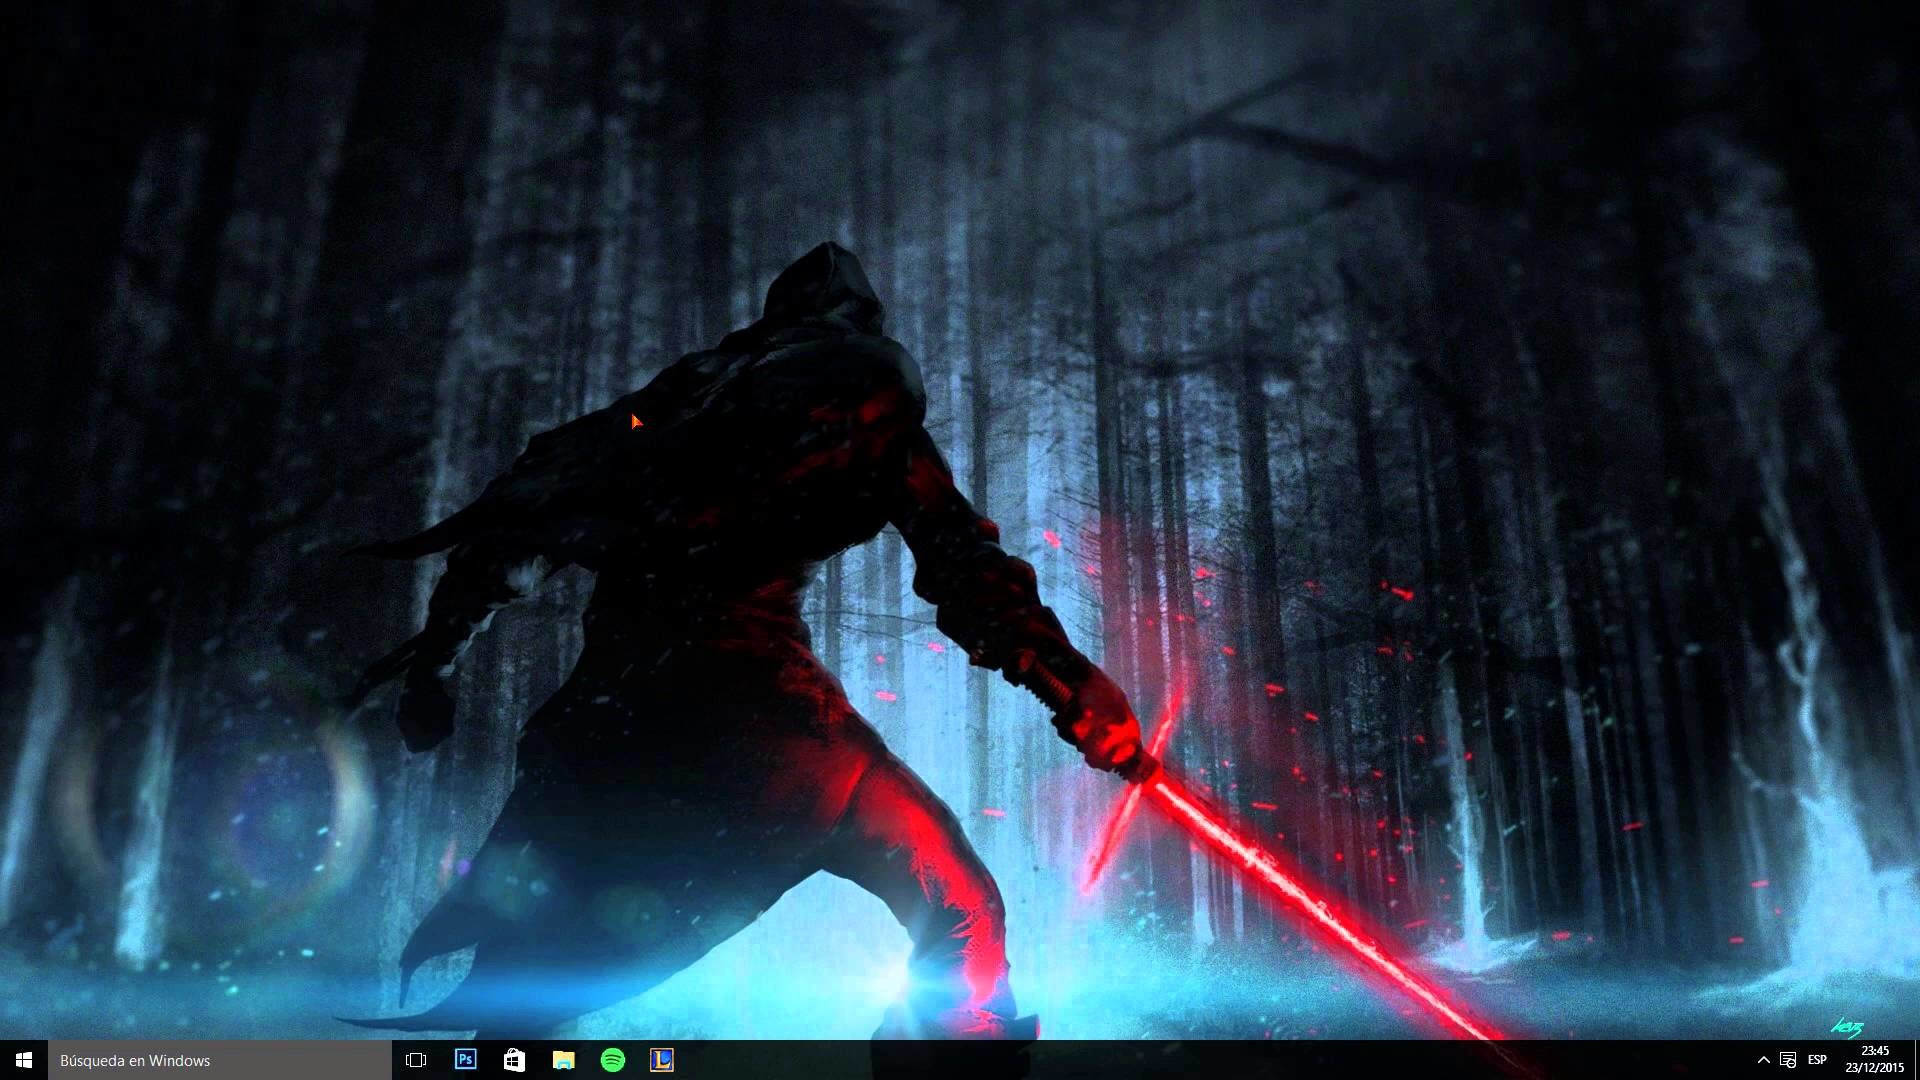 Windows Desktop Images Gif Backgrounds Windows 10